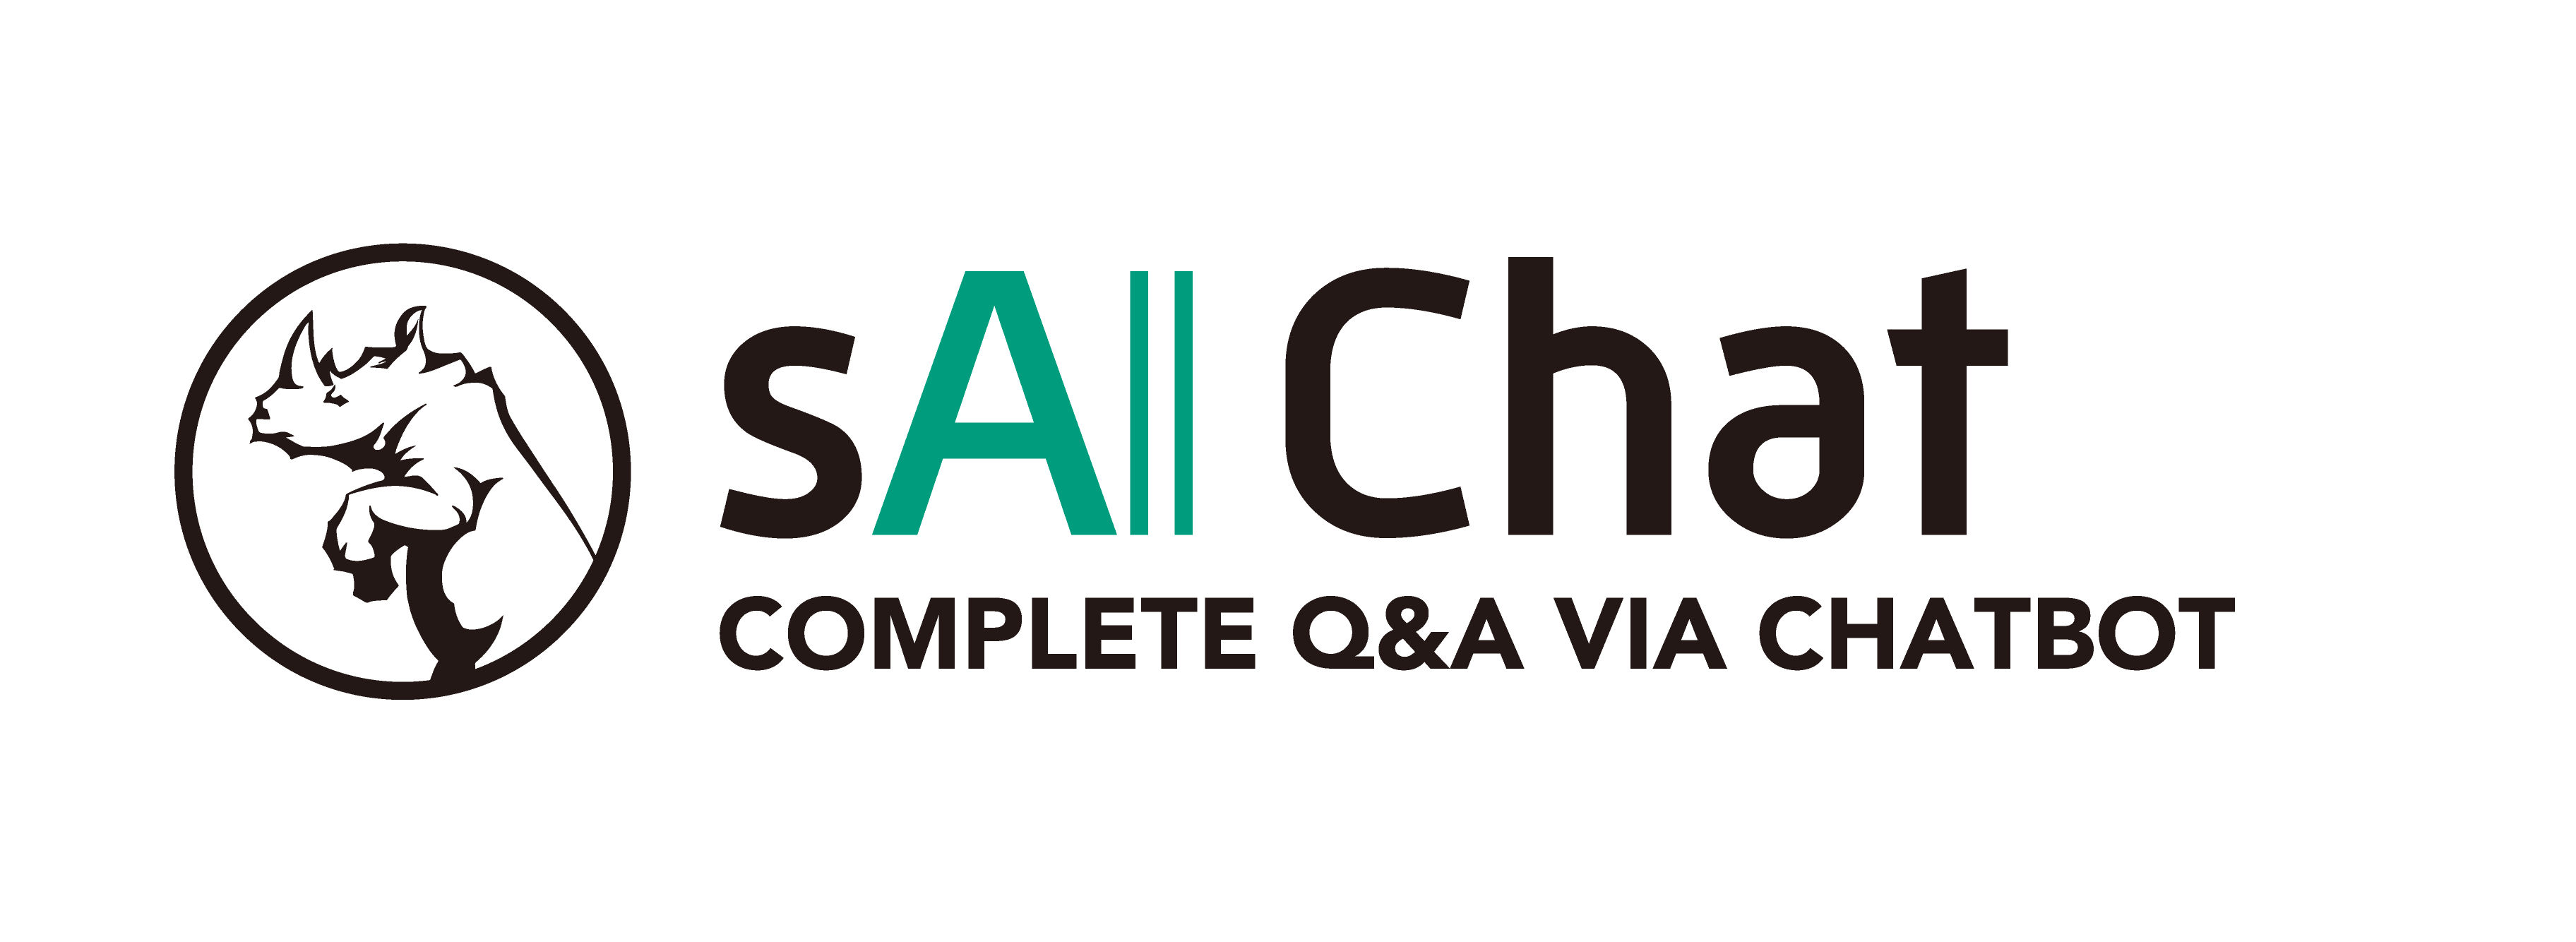 sAI Chat|インタビュー掲載